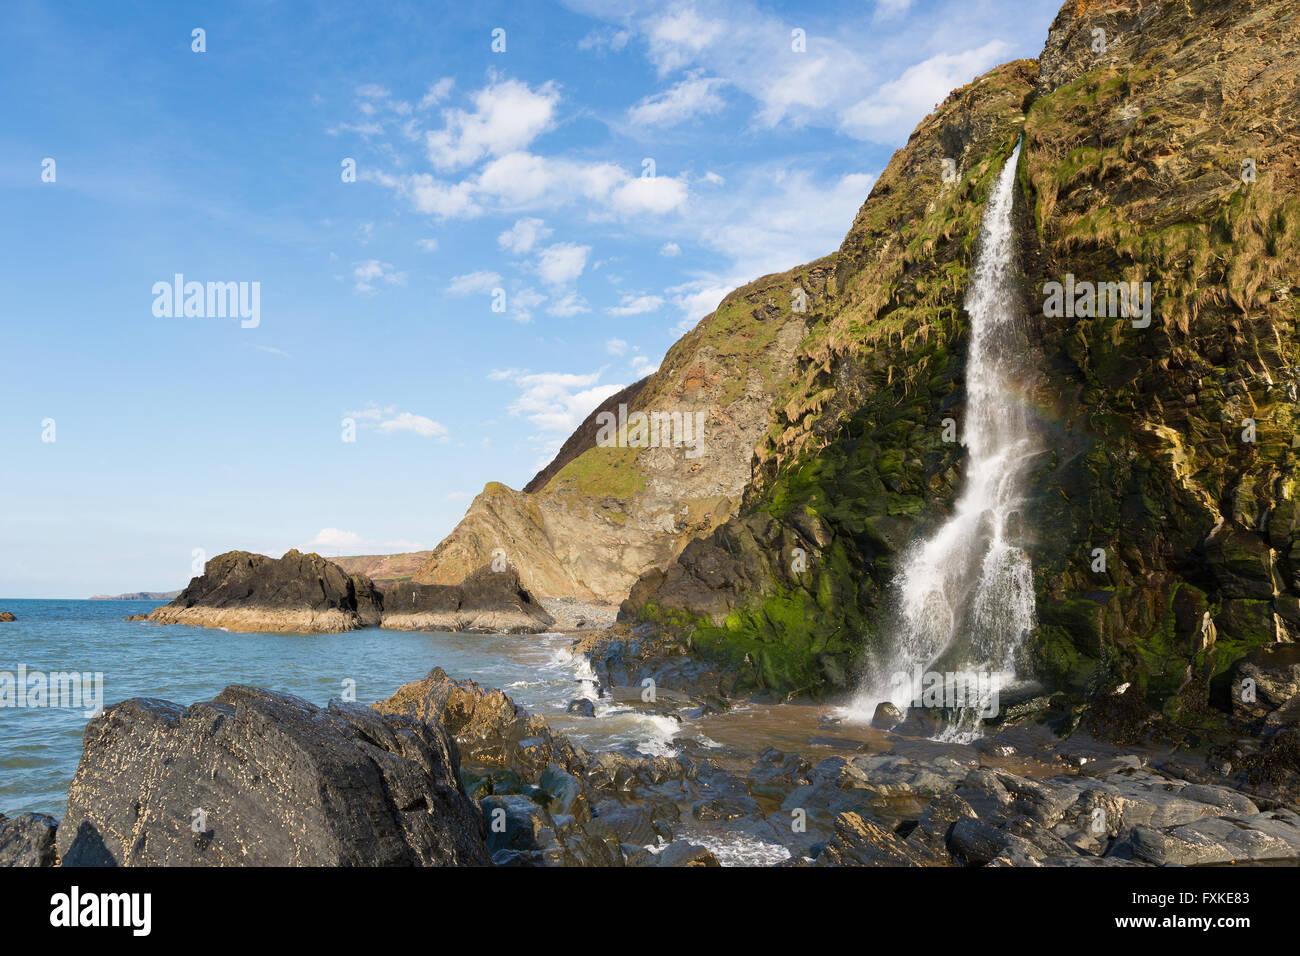 Waterfall at Tresaith Beach, Cardigan Bay, Wales. - Stock Image